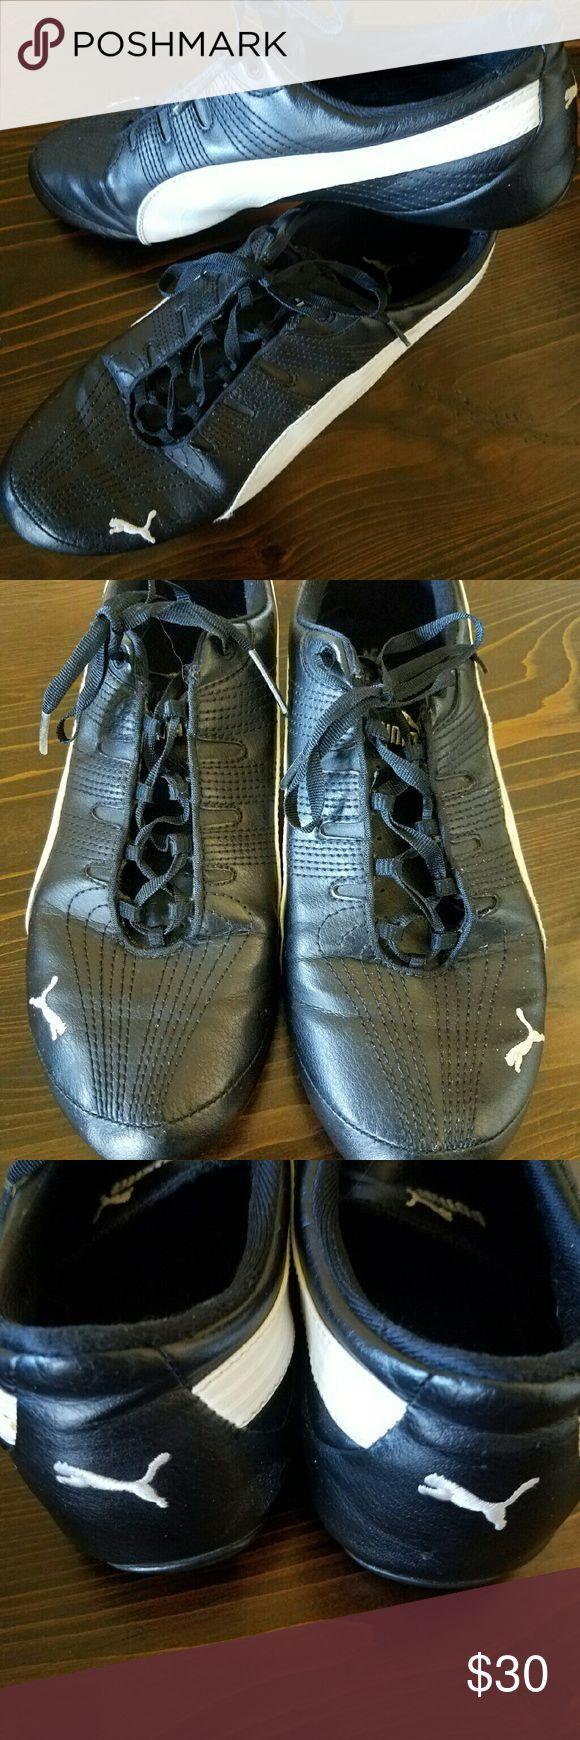 Ladies Puma Leather Shoes EUC Ladies leather black and white Puma shoes. So comfortable! Puma Shoes Athletic Shoes